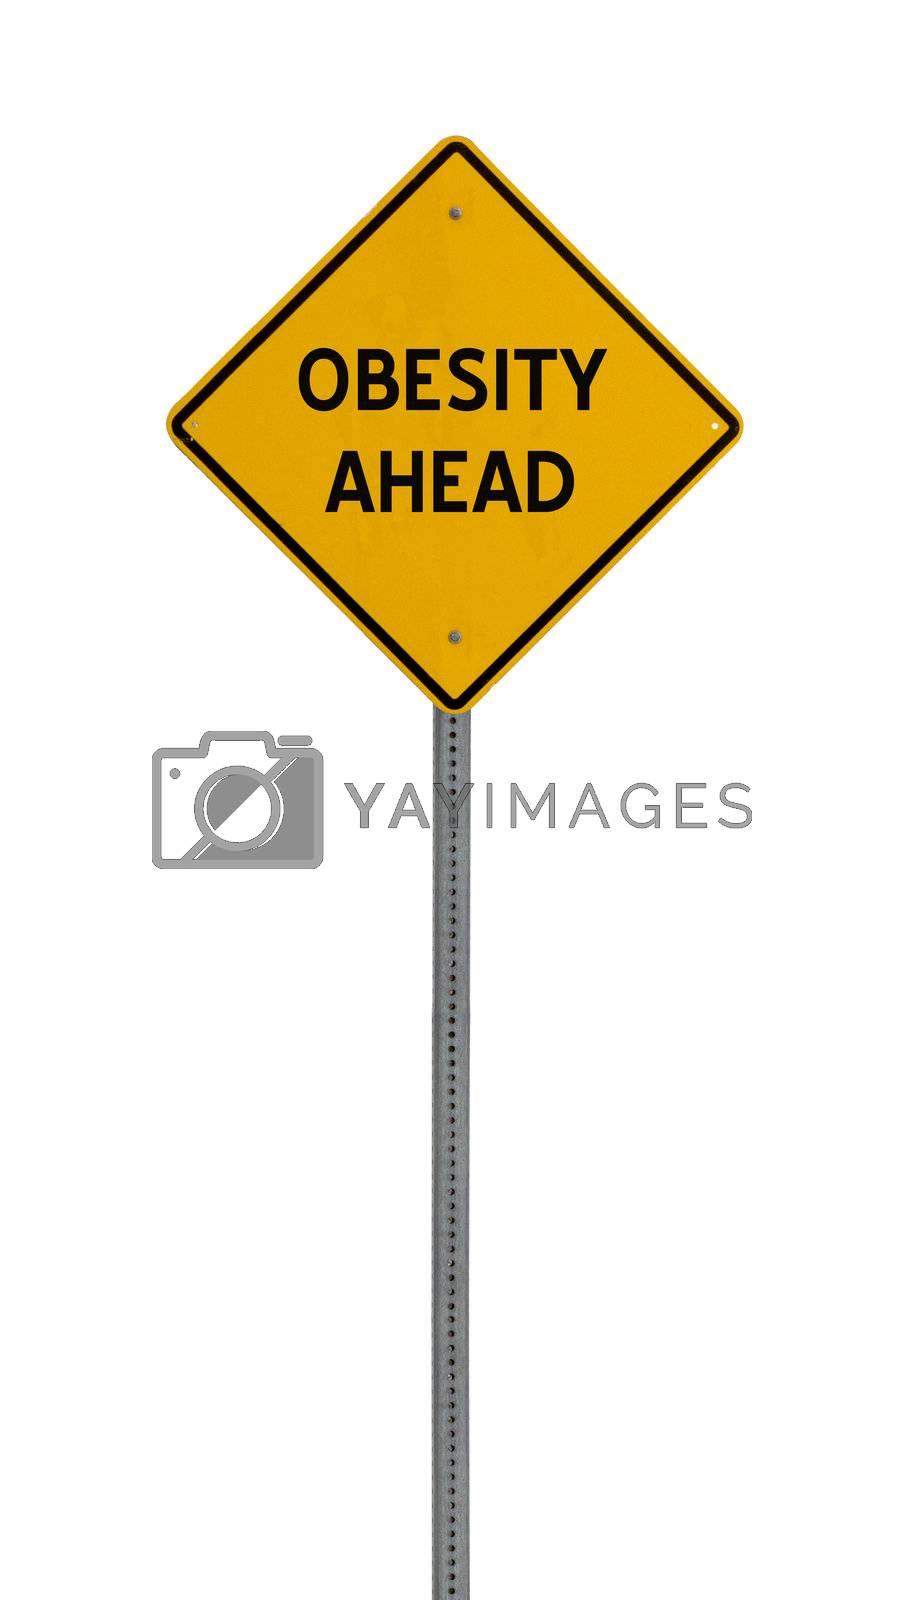 yellow road hazard sign